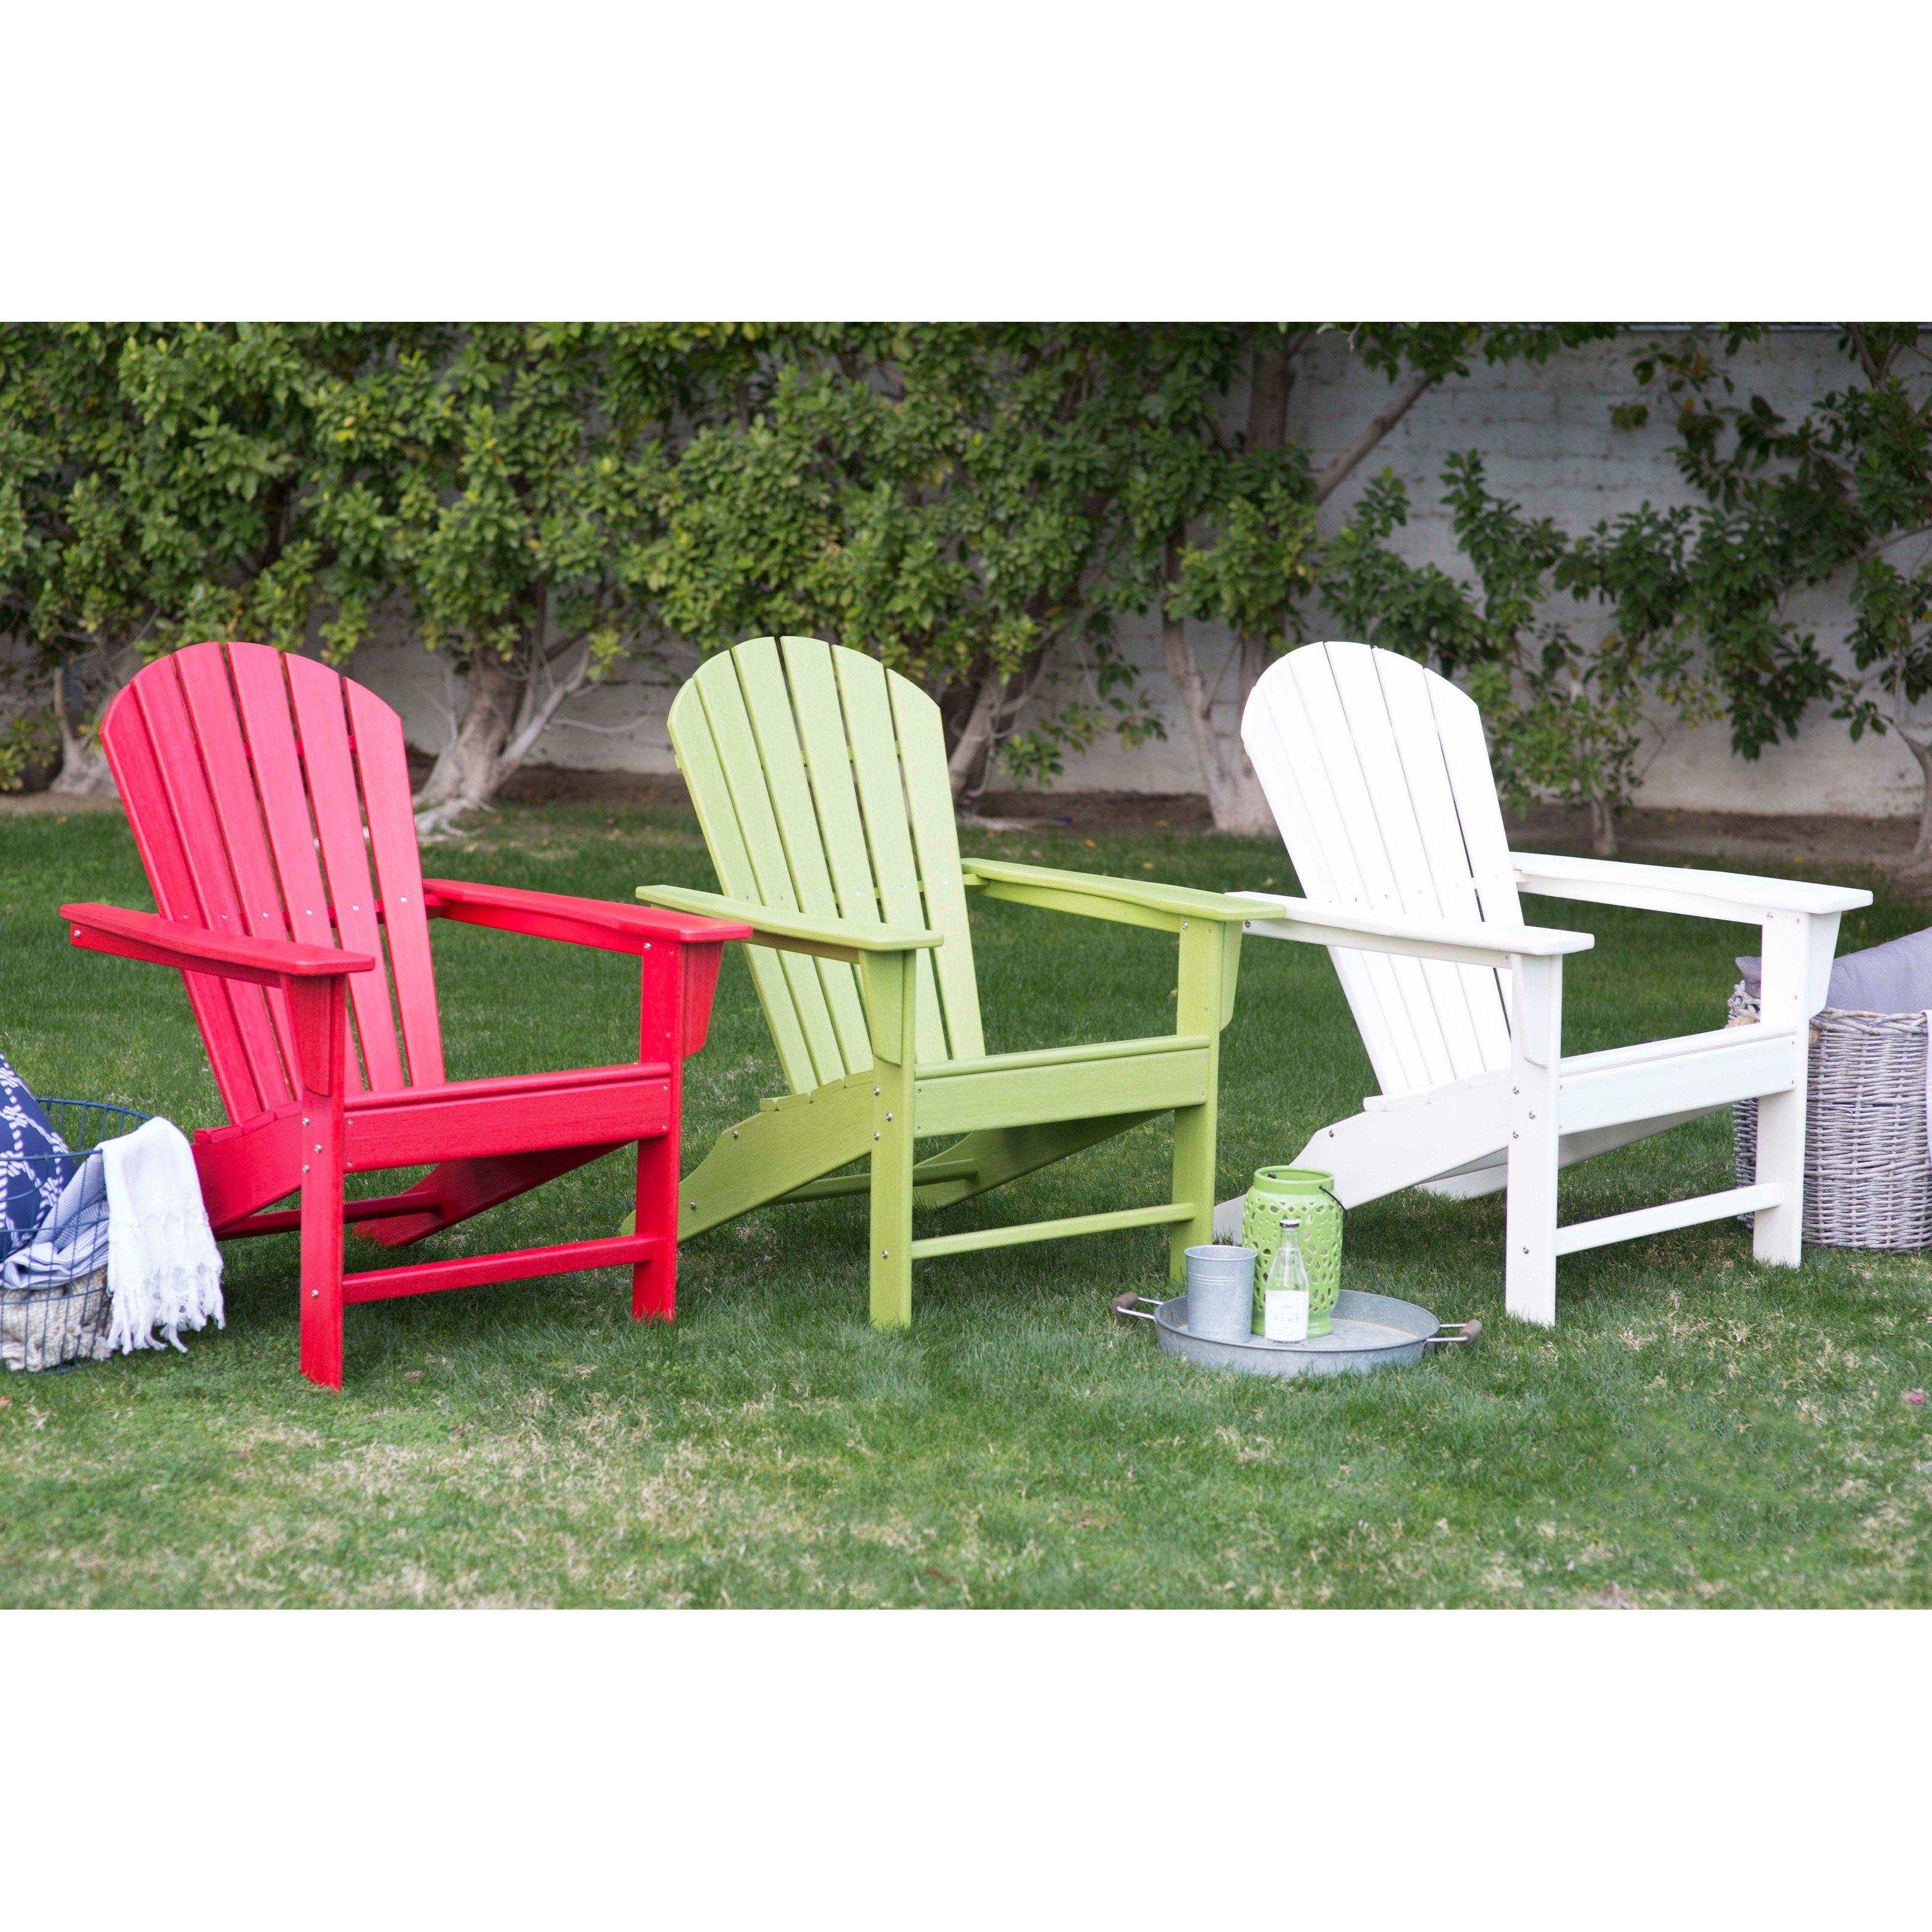 White Resin Adirondack Chairs.Outdoor Belham Living Belmore Recycled Plastic Classic